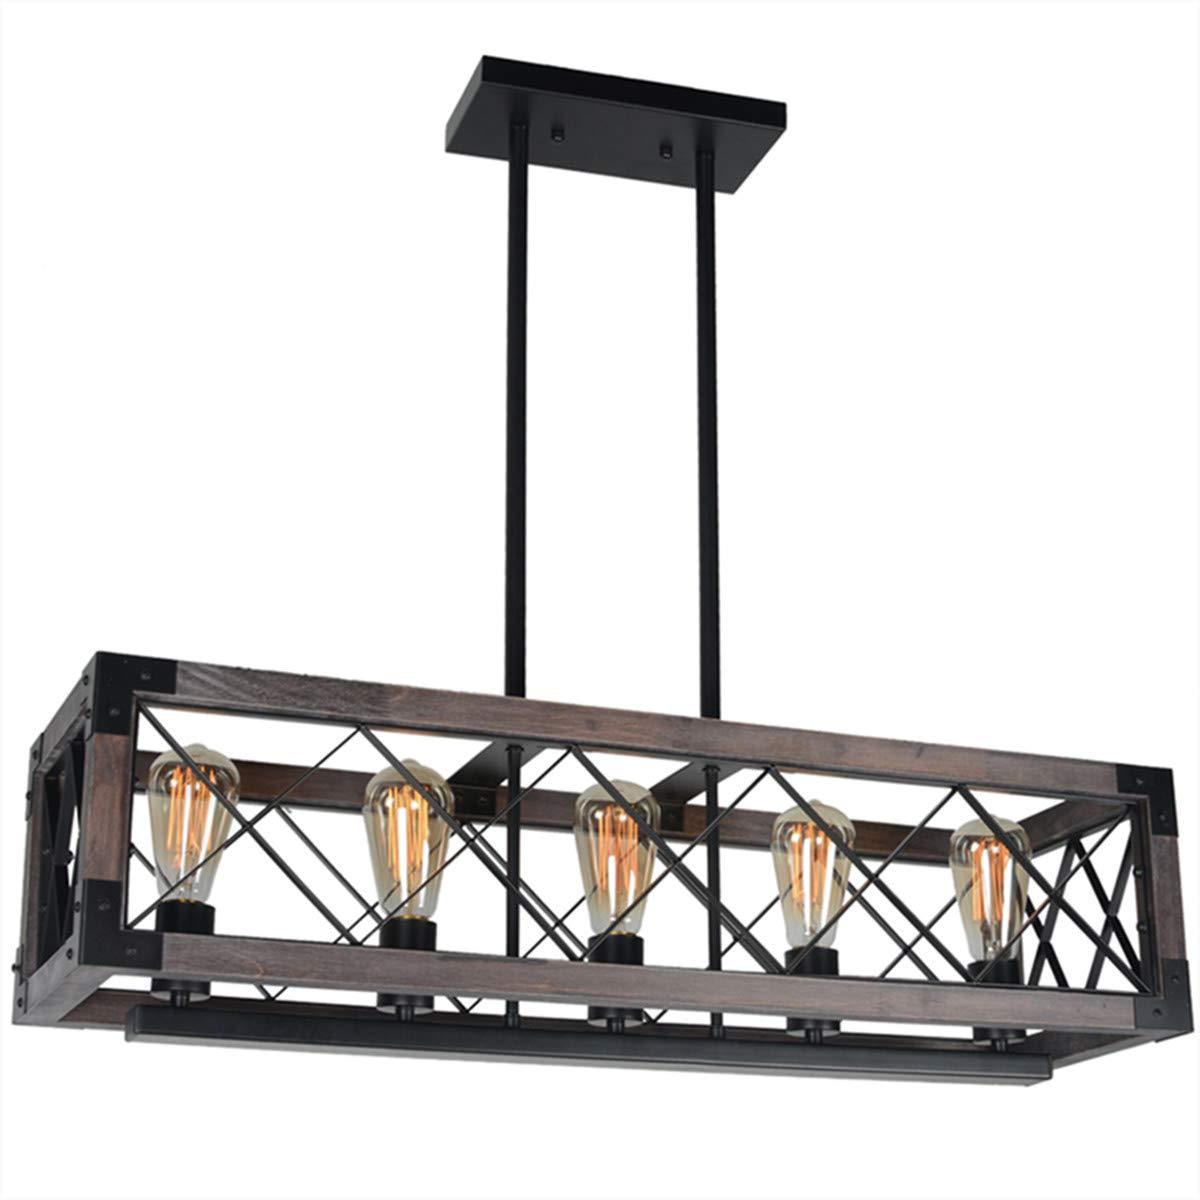 Baiwaiz Rustic Wood Chandelier, Metal Rectangle Dining Room Chandelier Lighting Farmhouse Kitchen Island Light Fixtures 5 Lights Edison E26 032 by Baiwaiz